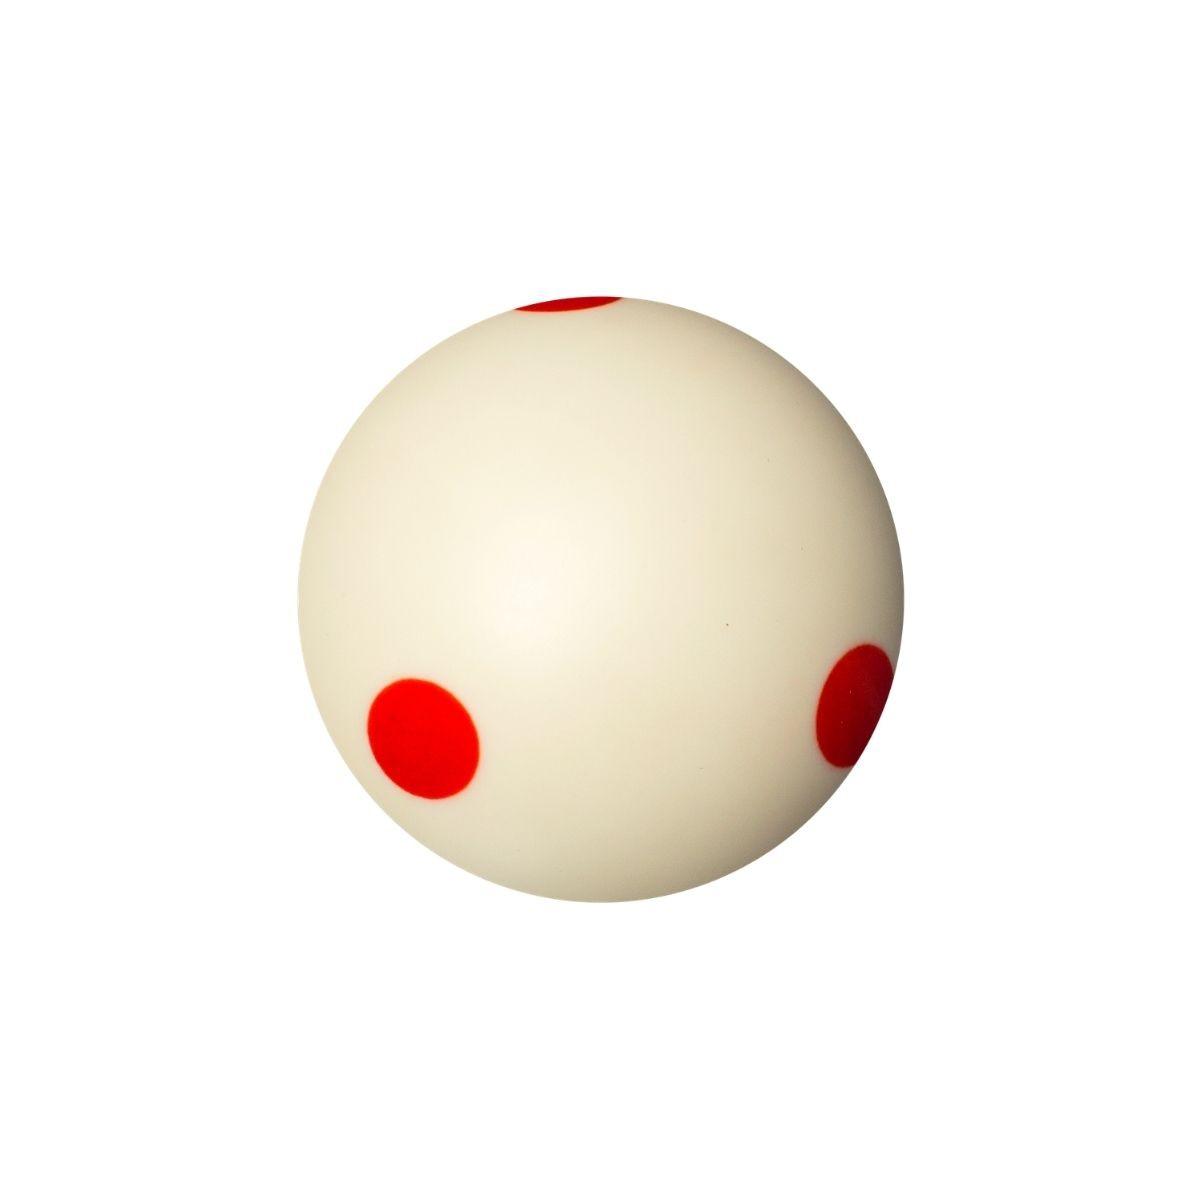 Bola de Treino Six Red Points 54mm para Bilhar Sinuca